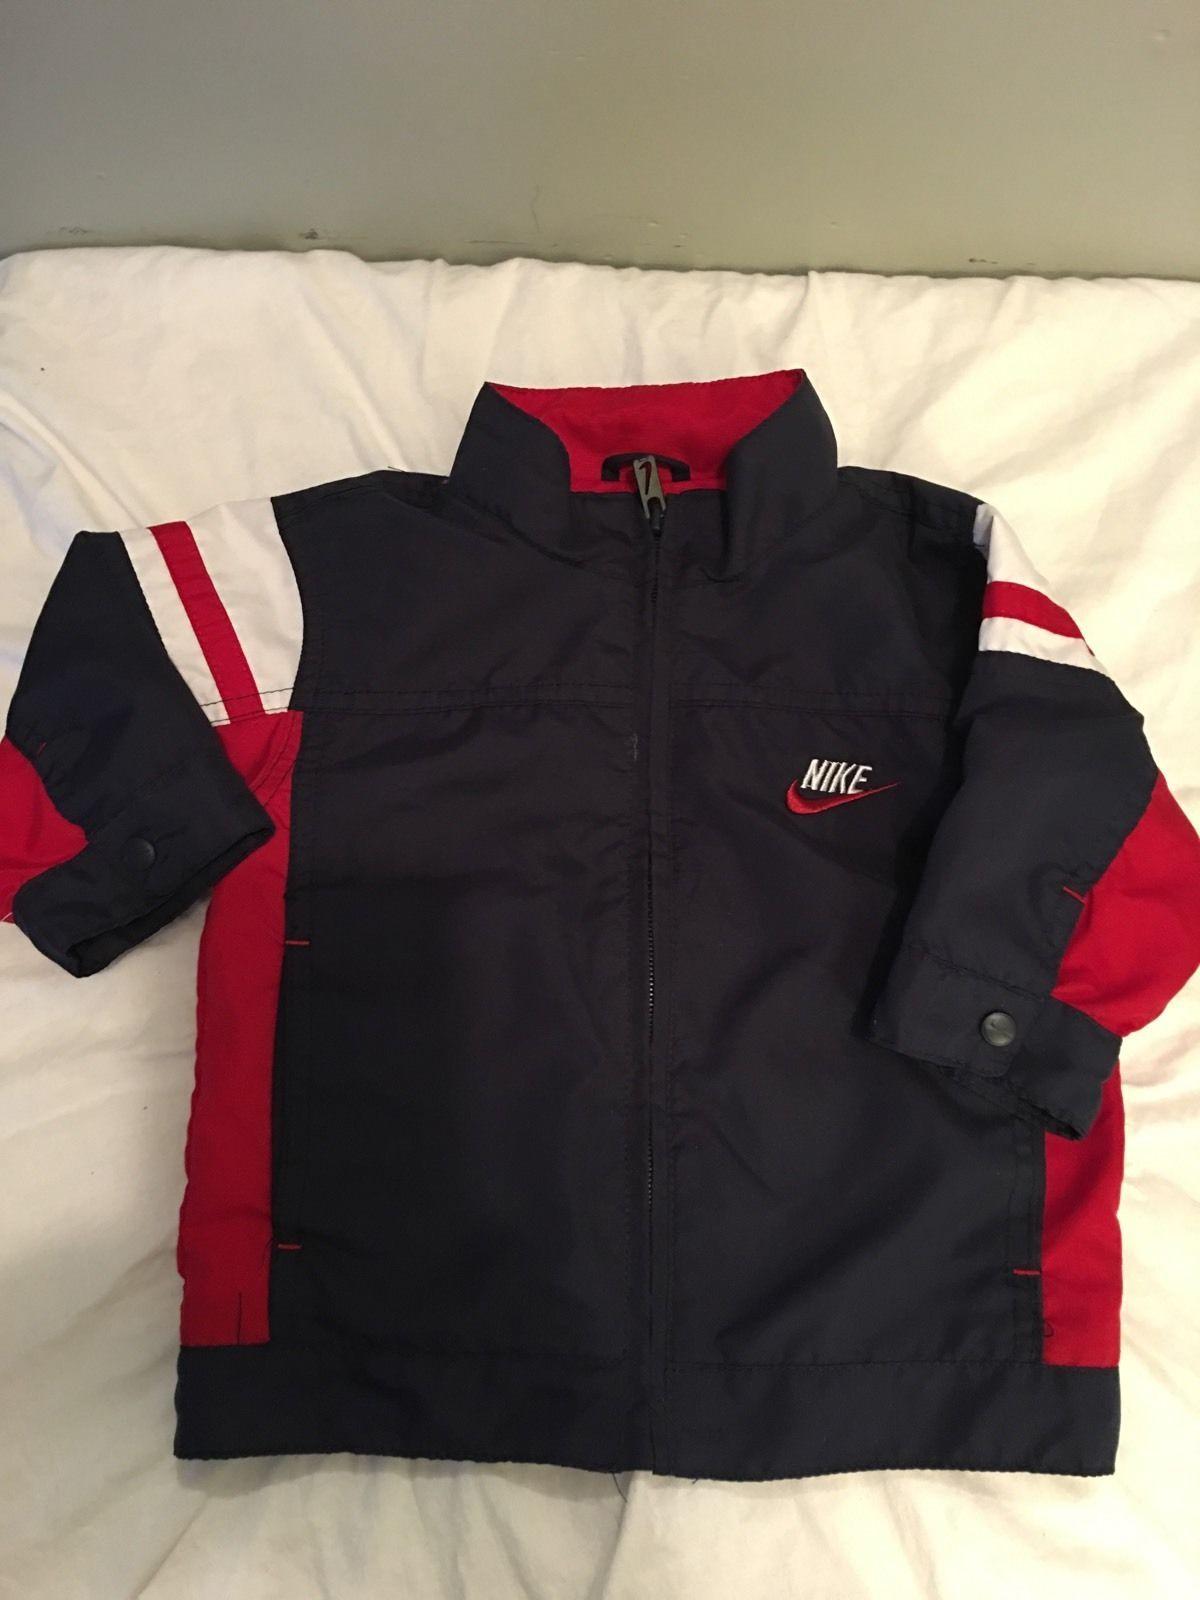 34620c9b160 Boys Infant Nike Jacket and 50 similar items. S l1600